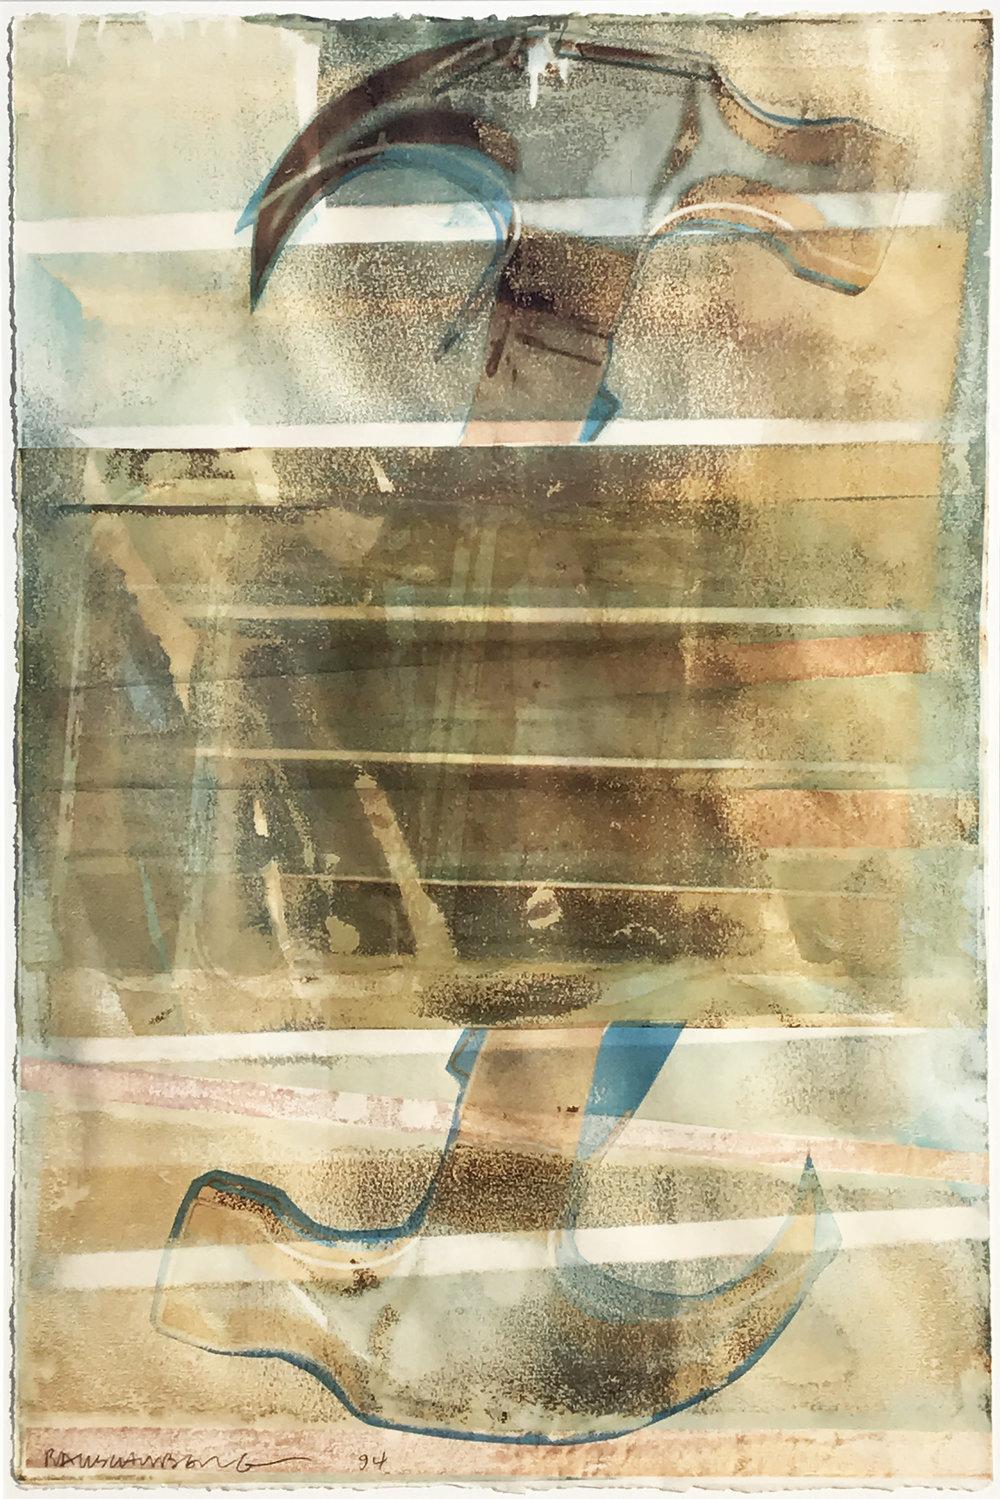 Robert Rauschenberg. Bang-Bang (Waterworks), 1994.